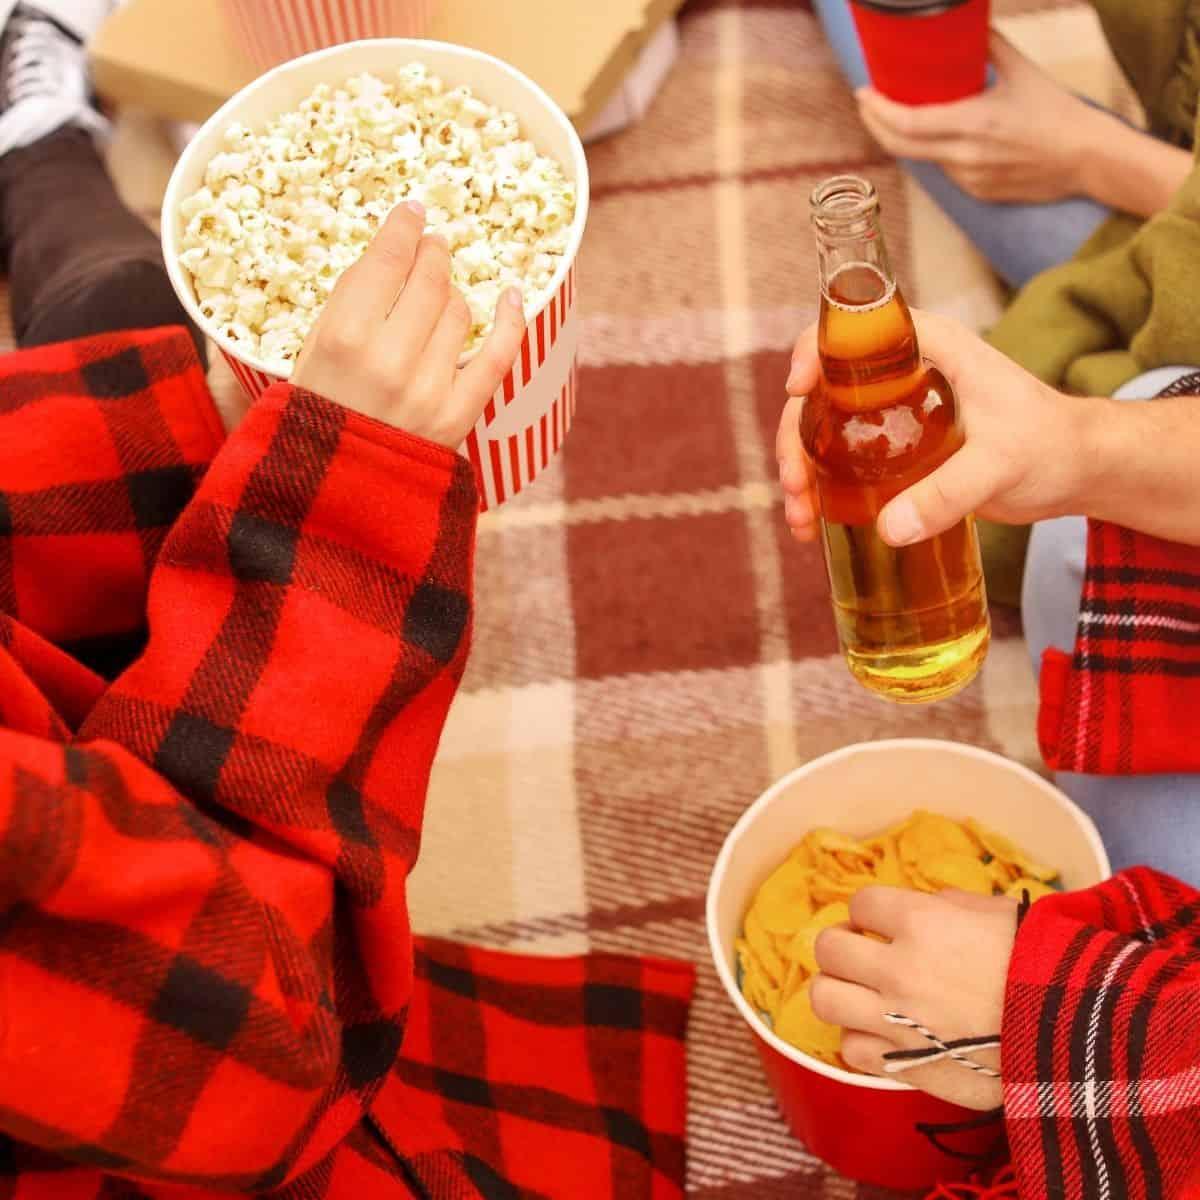 outdoor movie night popcorn and snacks